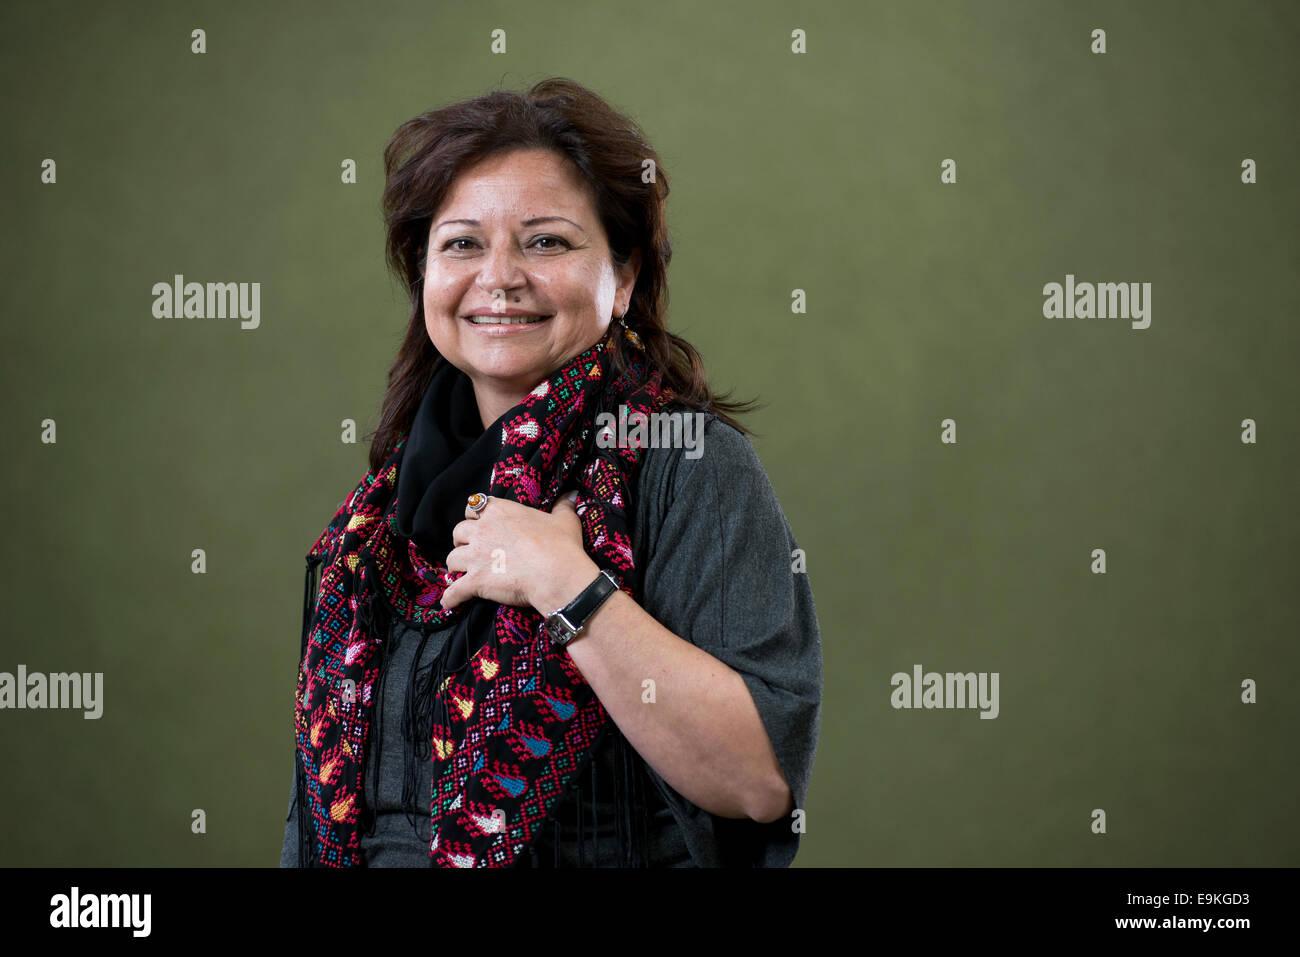 Author Alba Oudeh appears at the Edinburgh International Book Festival. - Stock Image